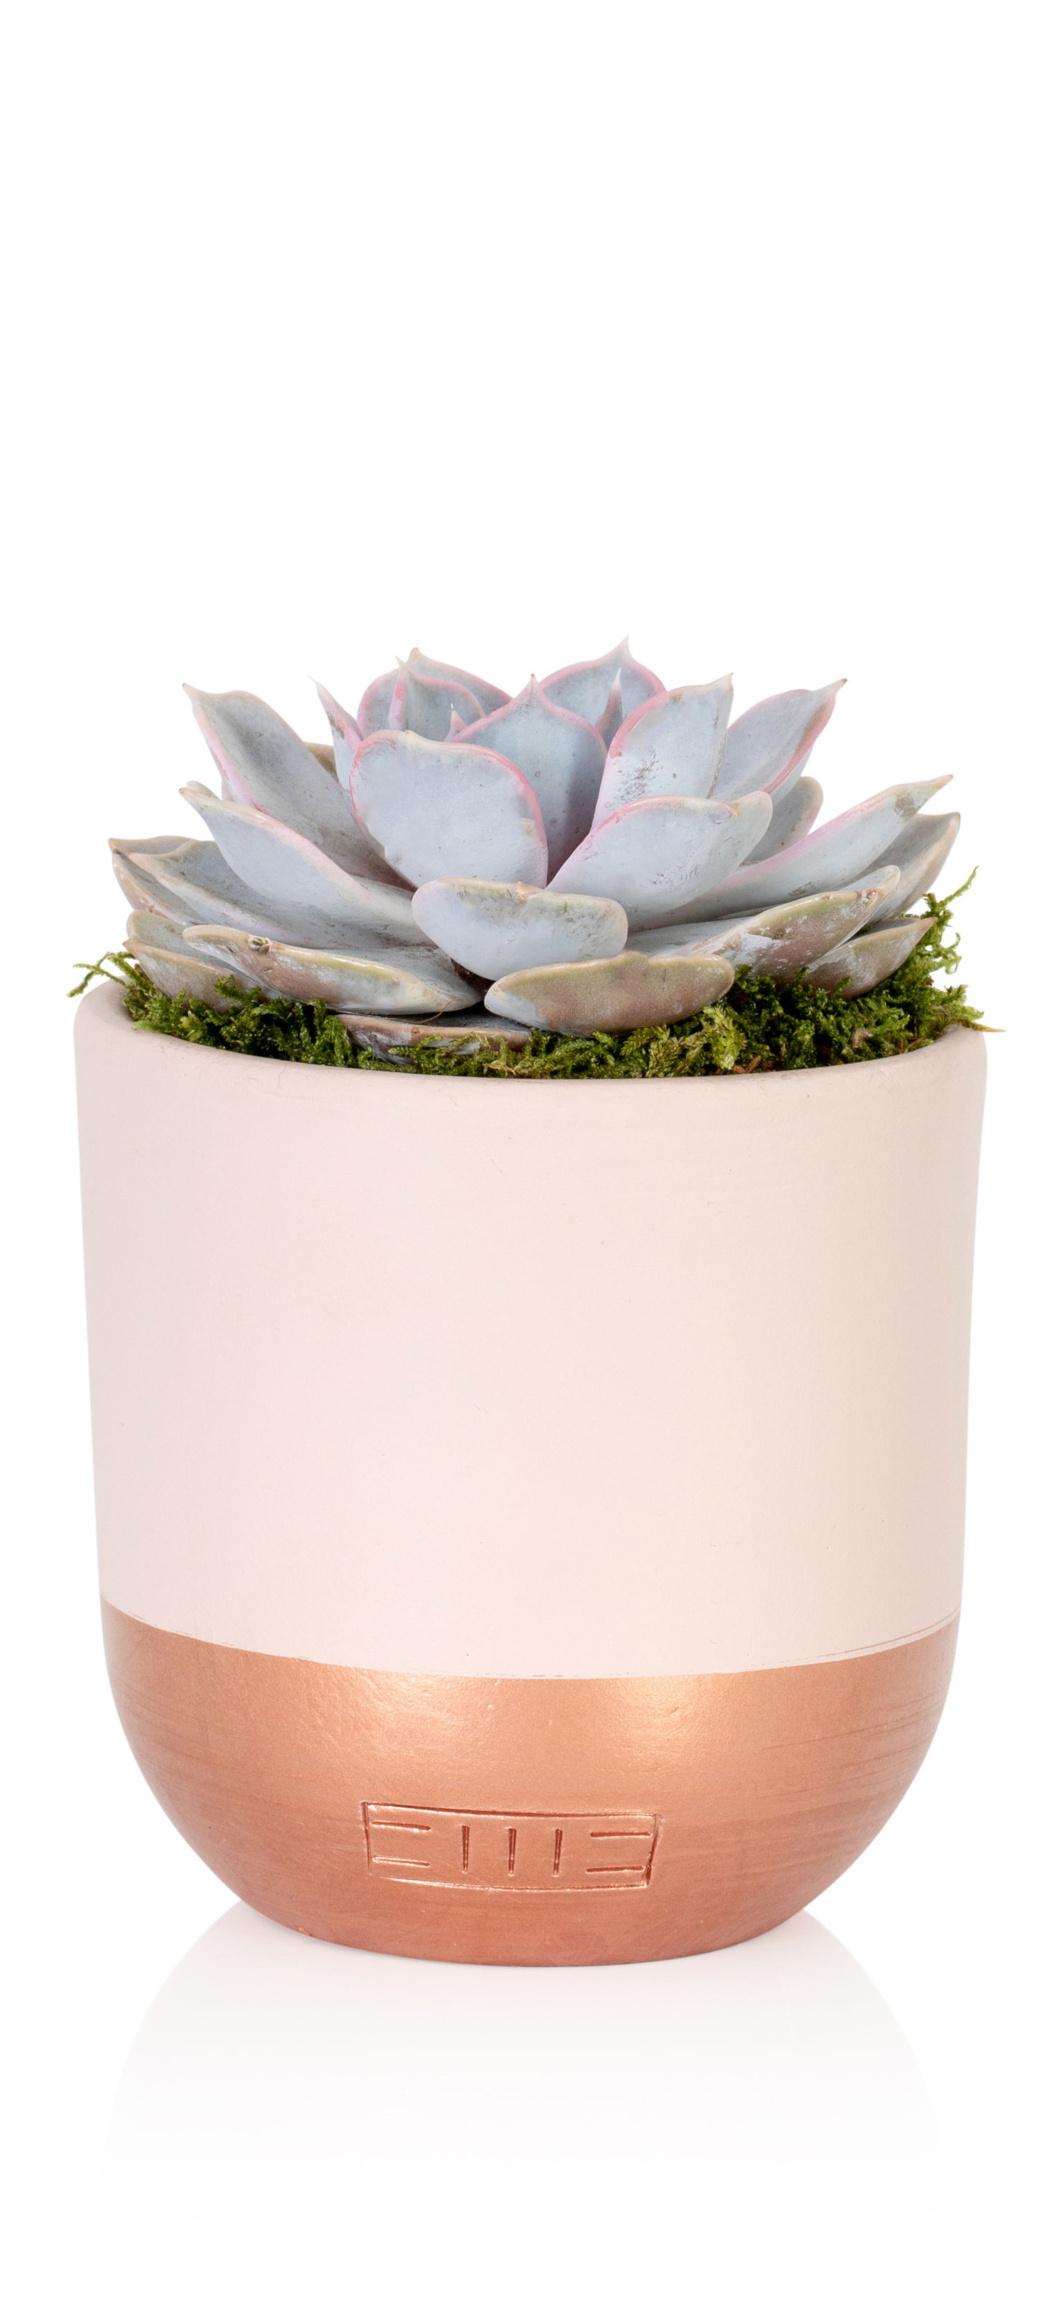 Little Botanical offers image